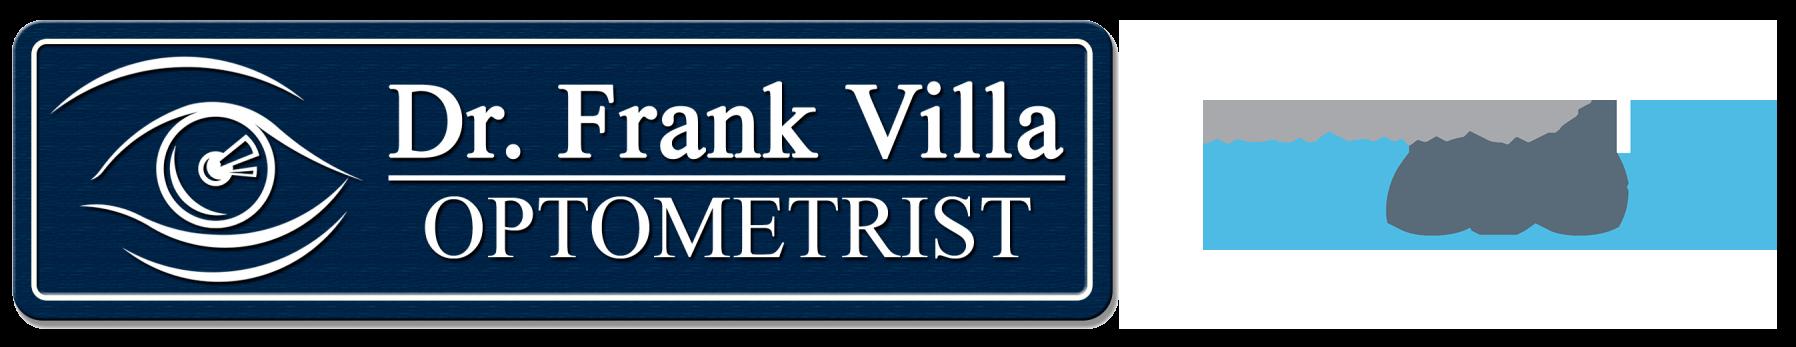 Dr Frank Villa